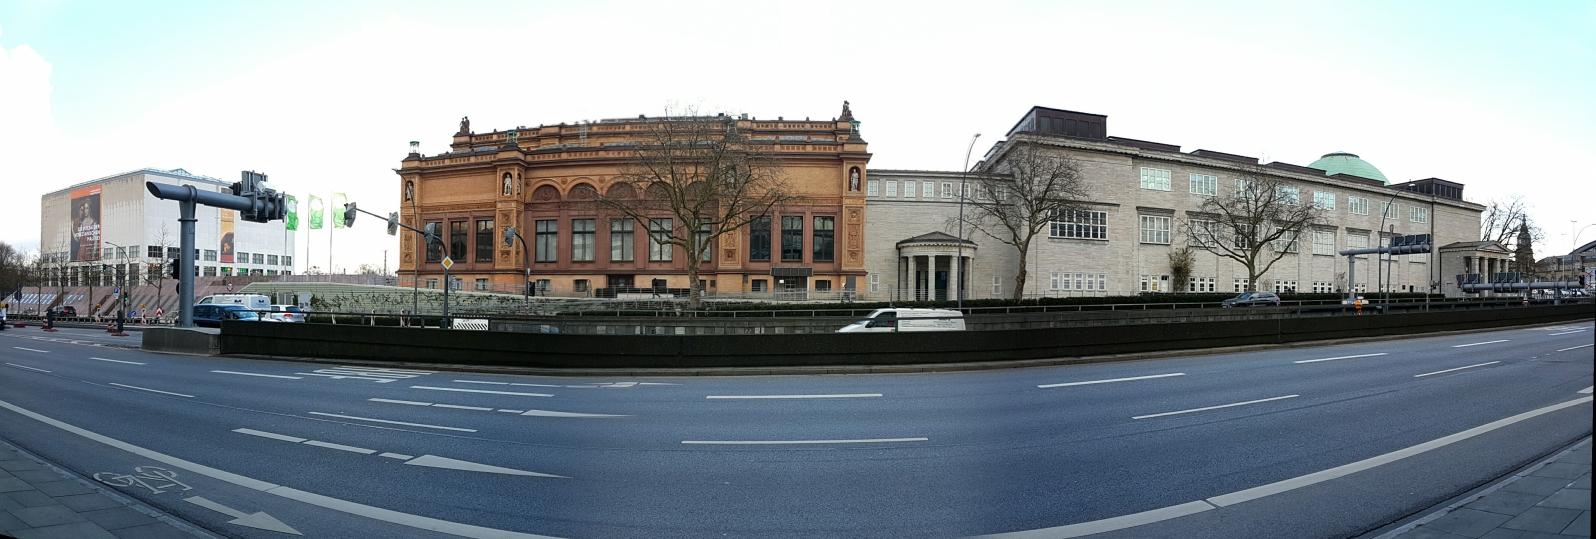 Hamburger Kunsthalle Am Glockengiesserwall